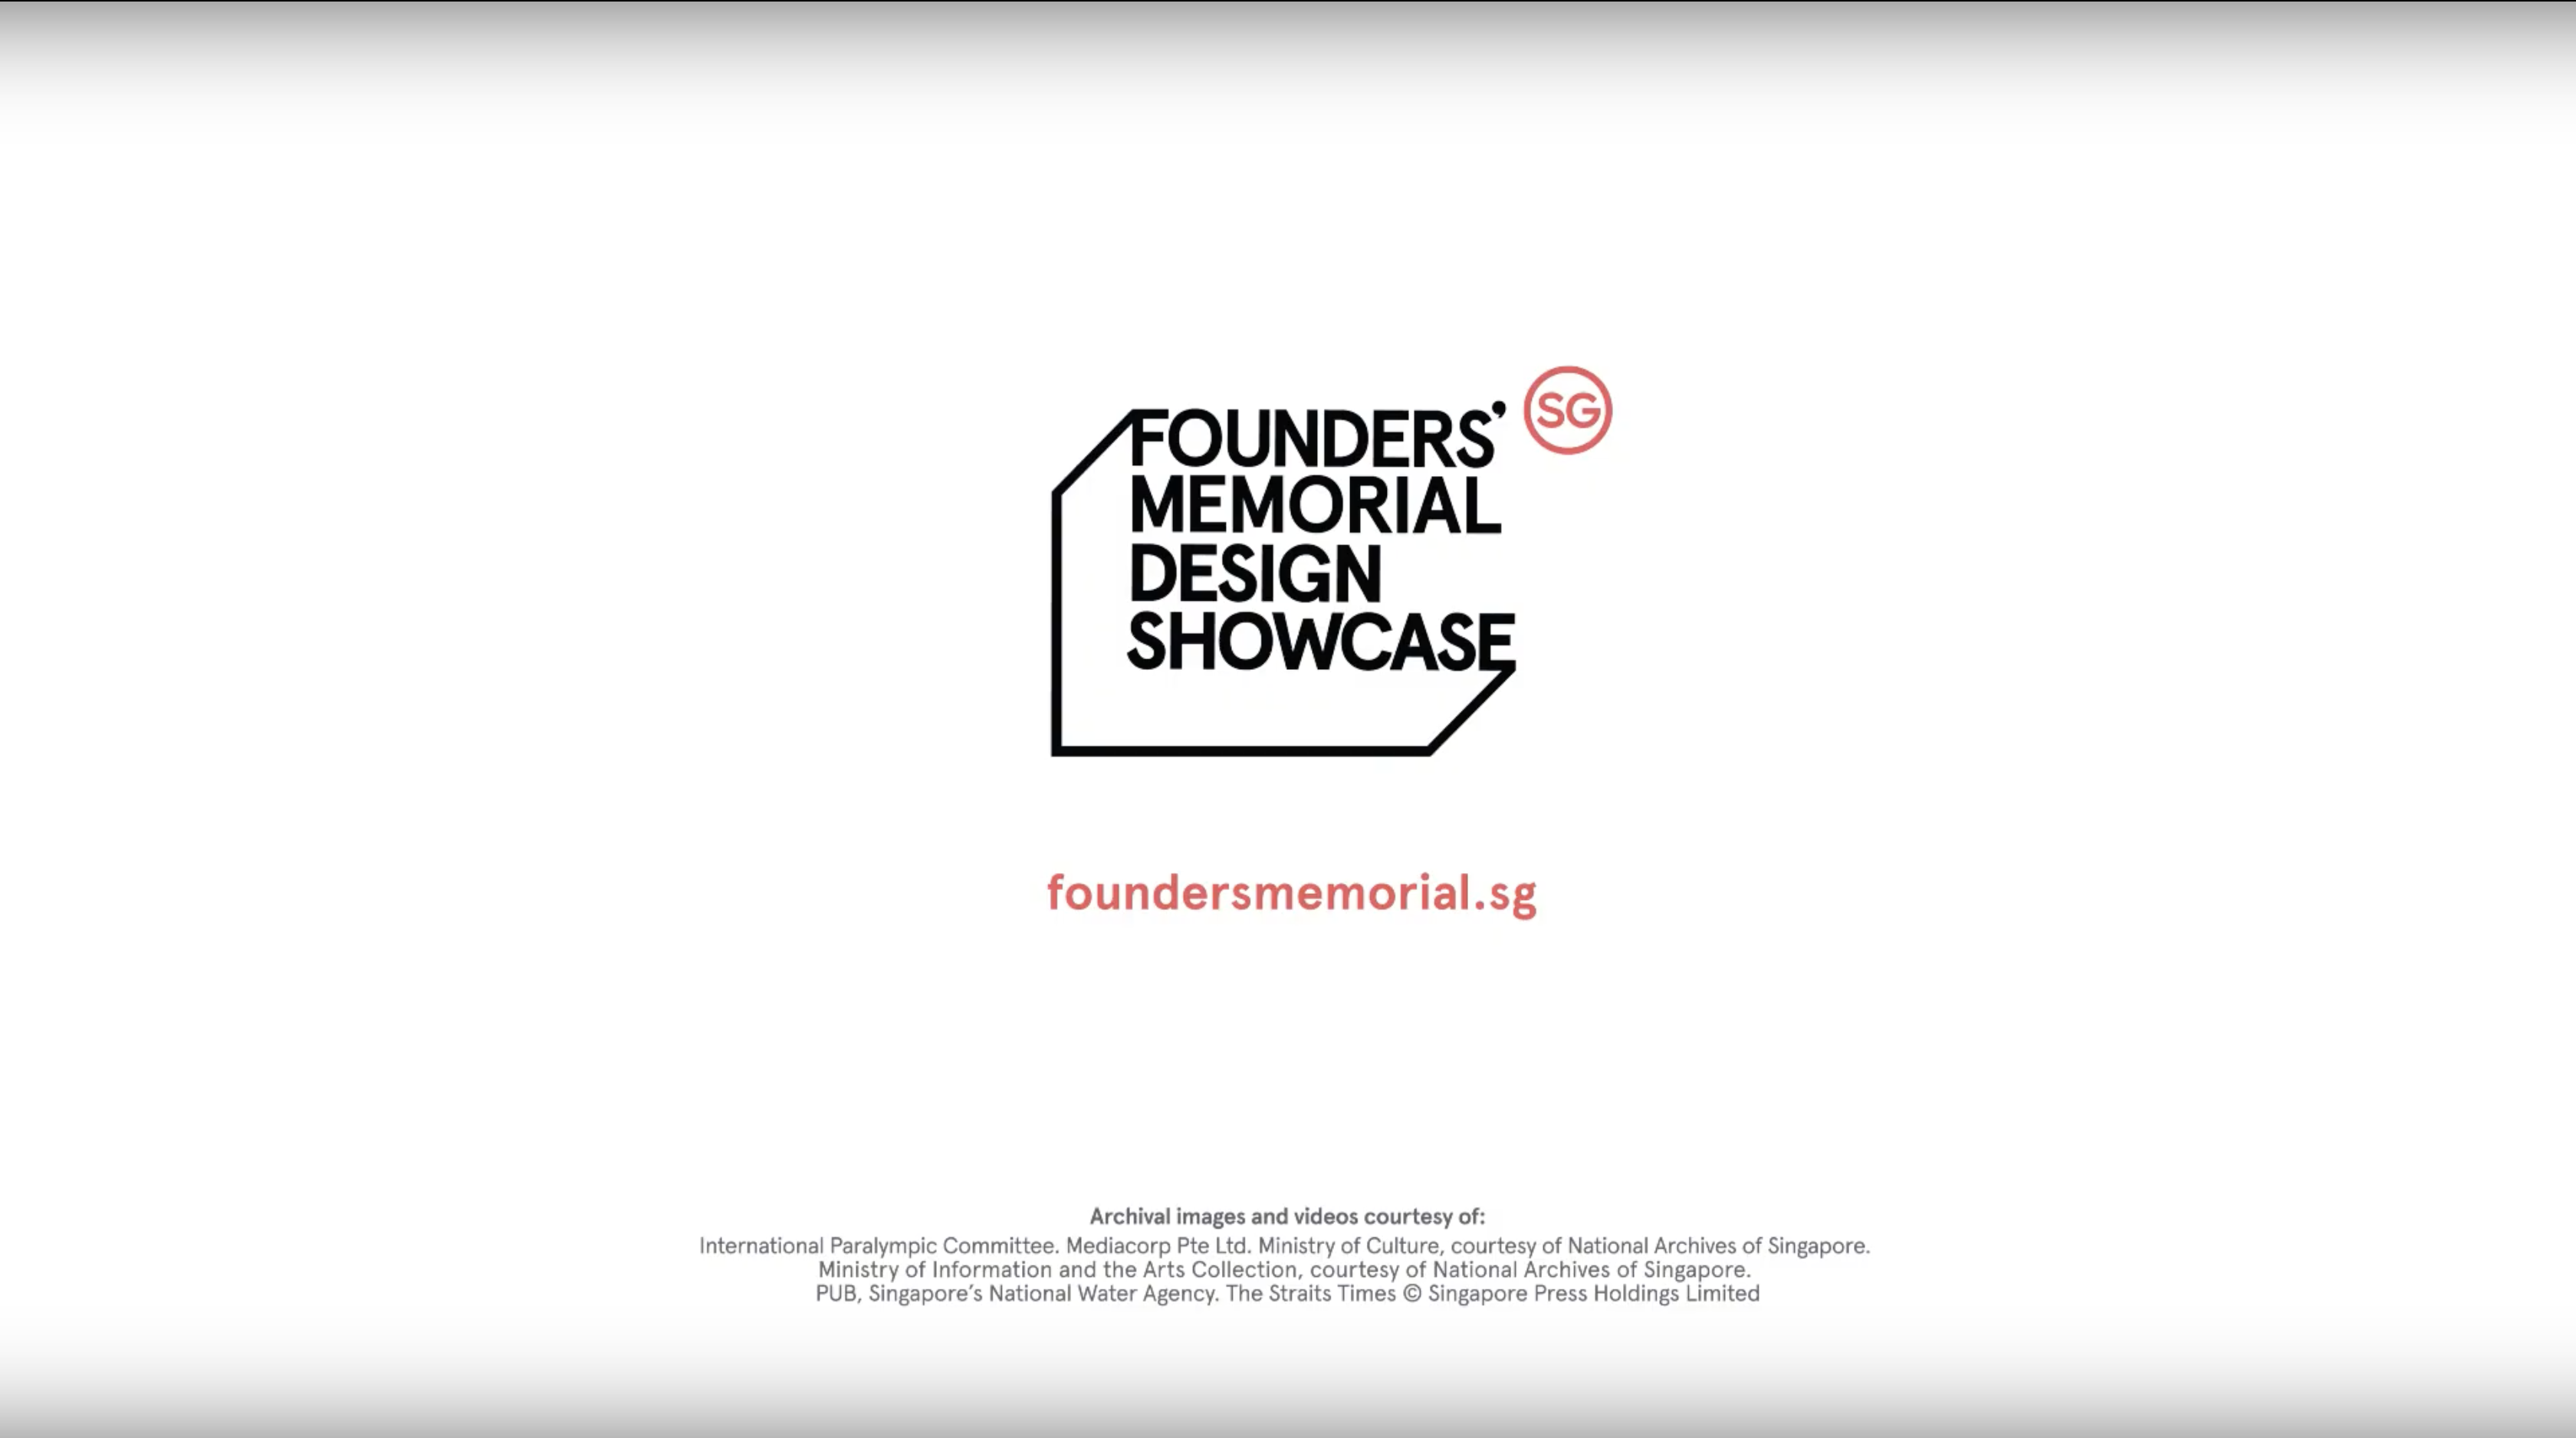 Founders Memorial Design Showcase